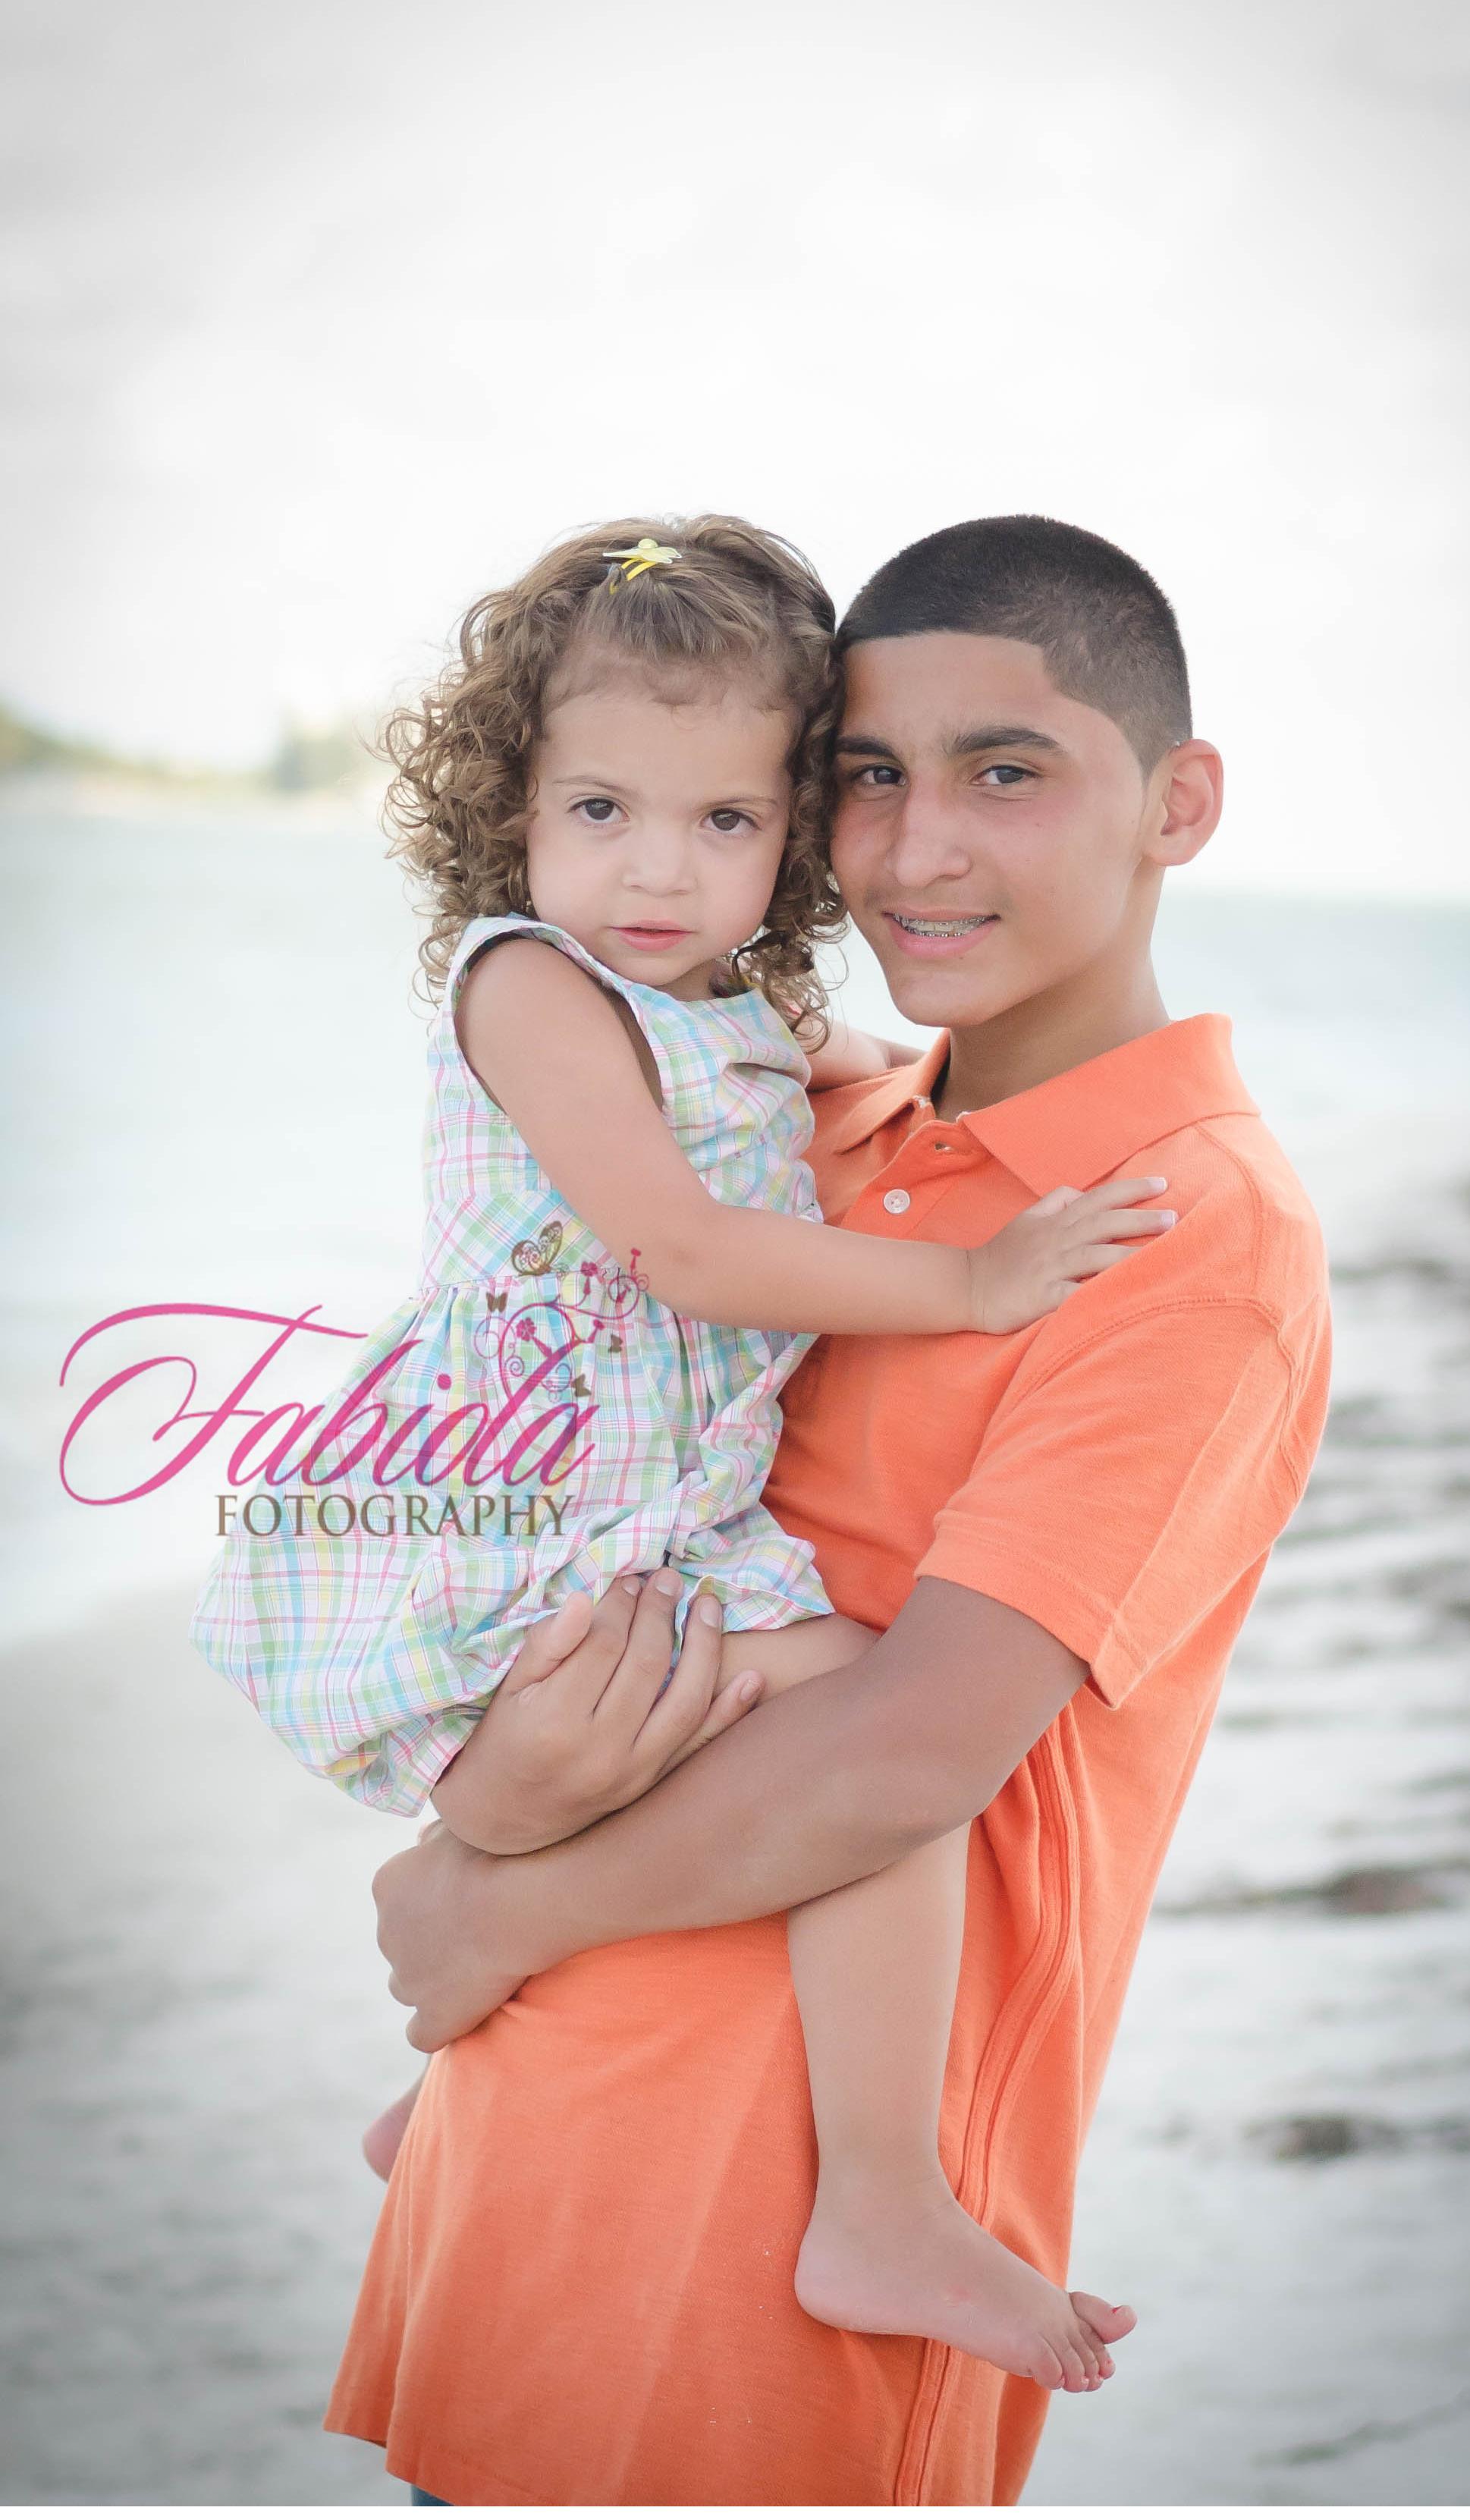 Fabiola Fotography image 32